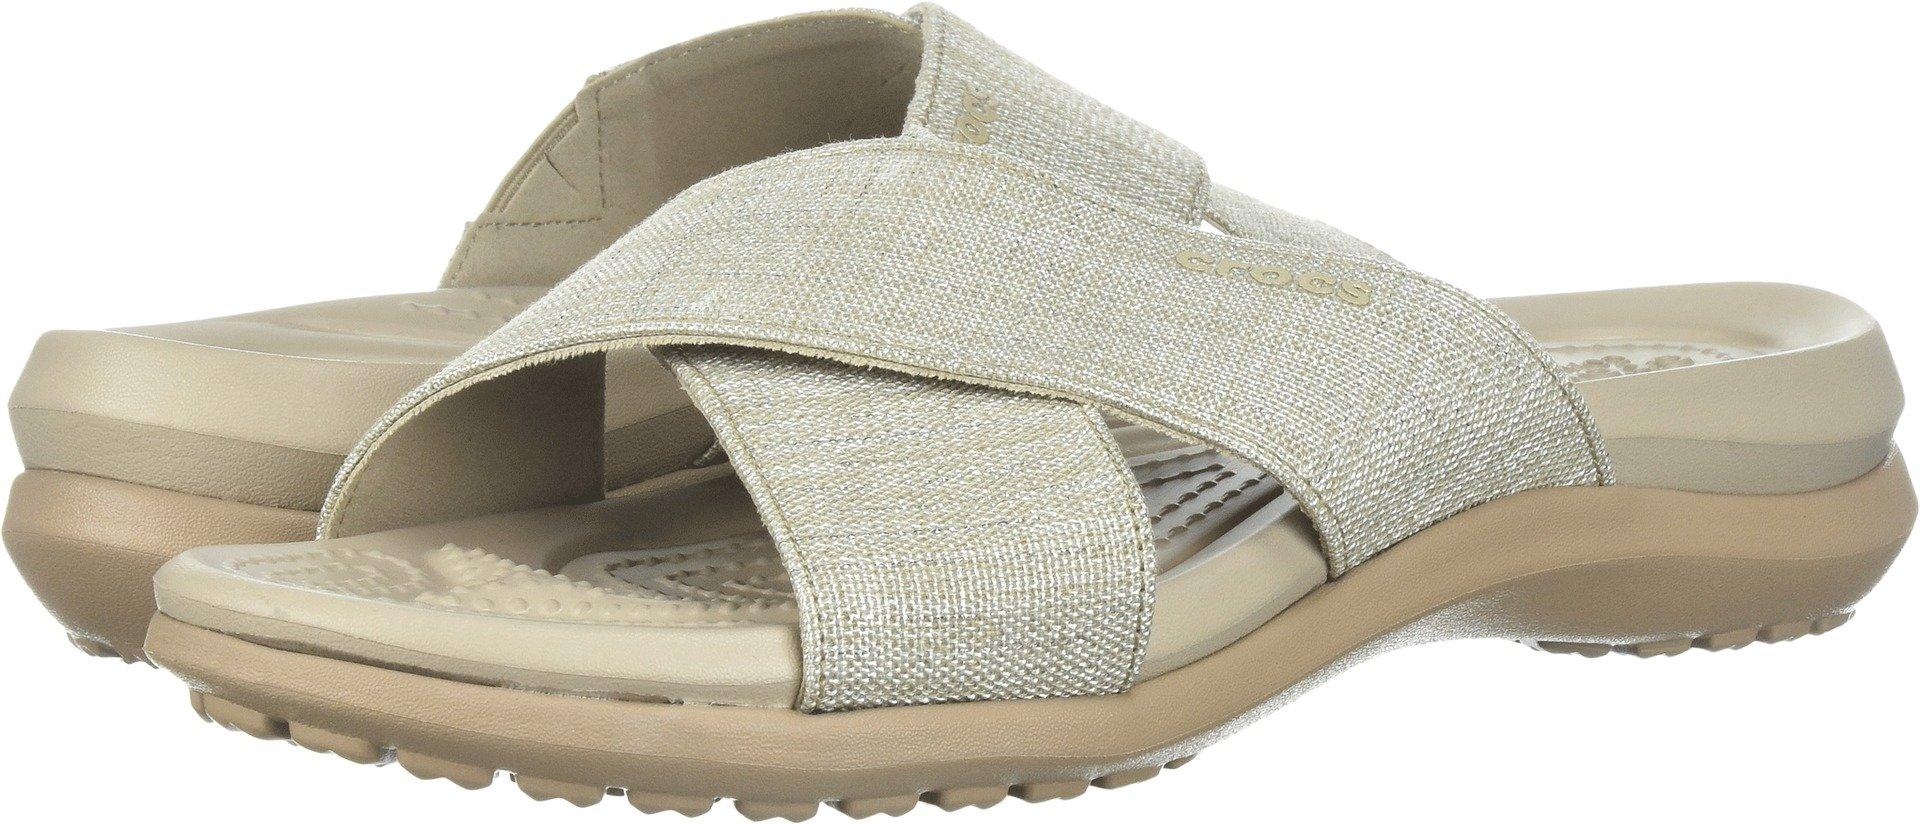 Crocs Women's Capri Shimmer Xband Sandal, Oyster/Cobblestone, 8 M US